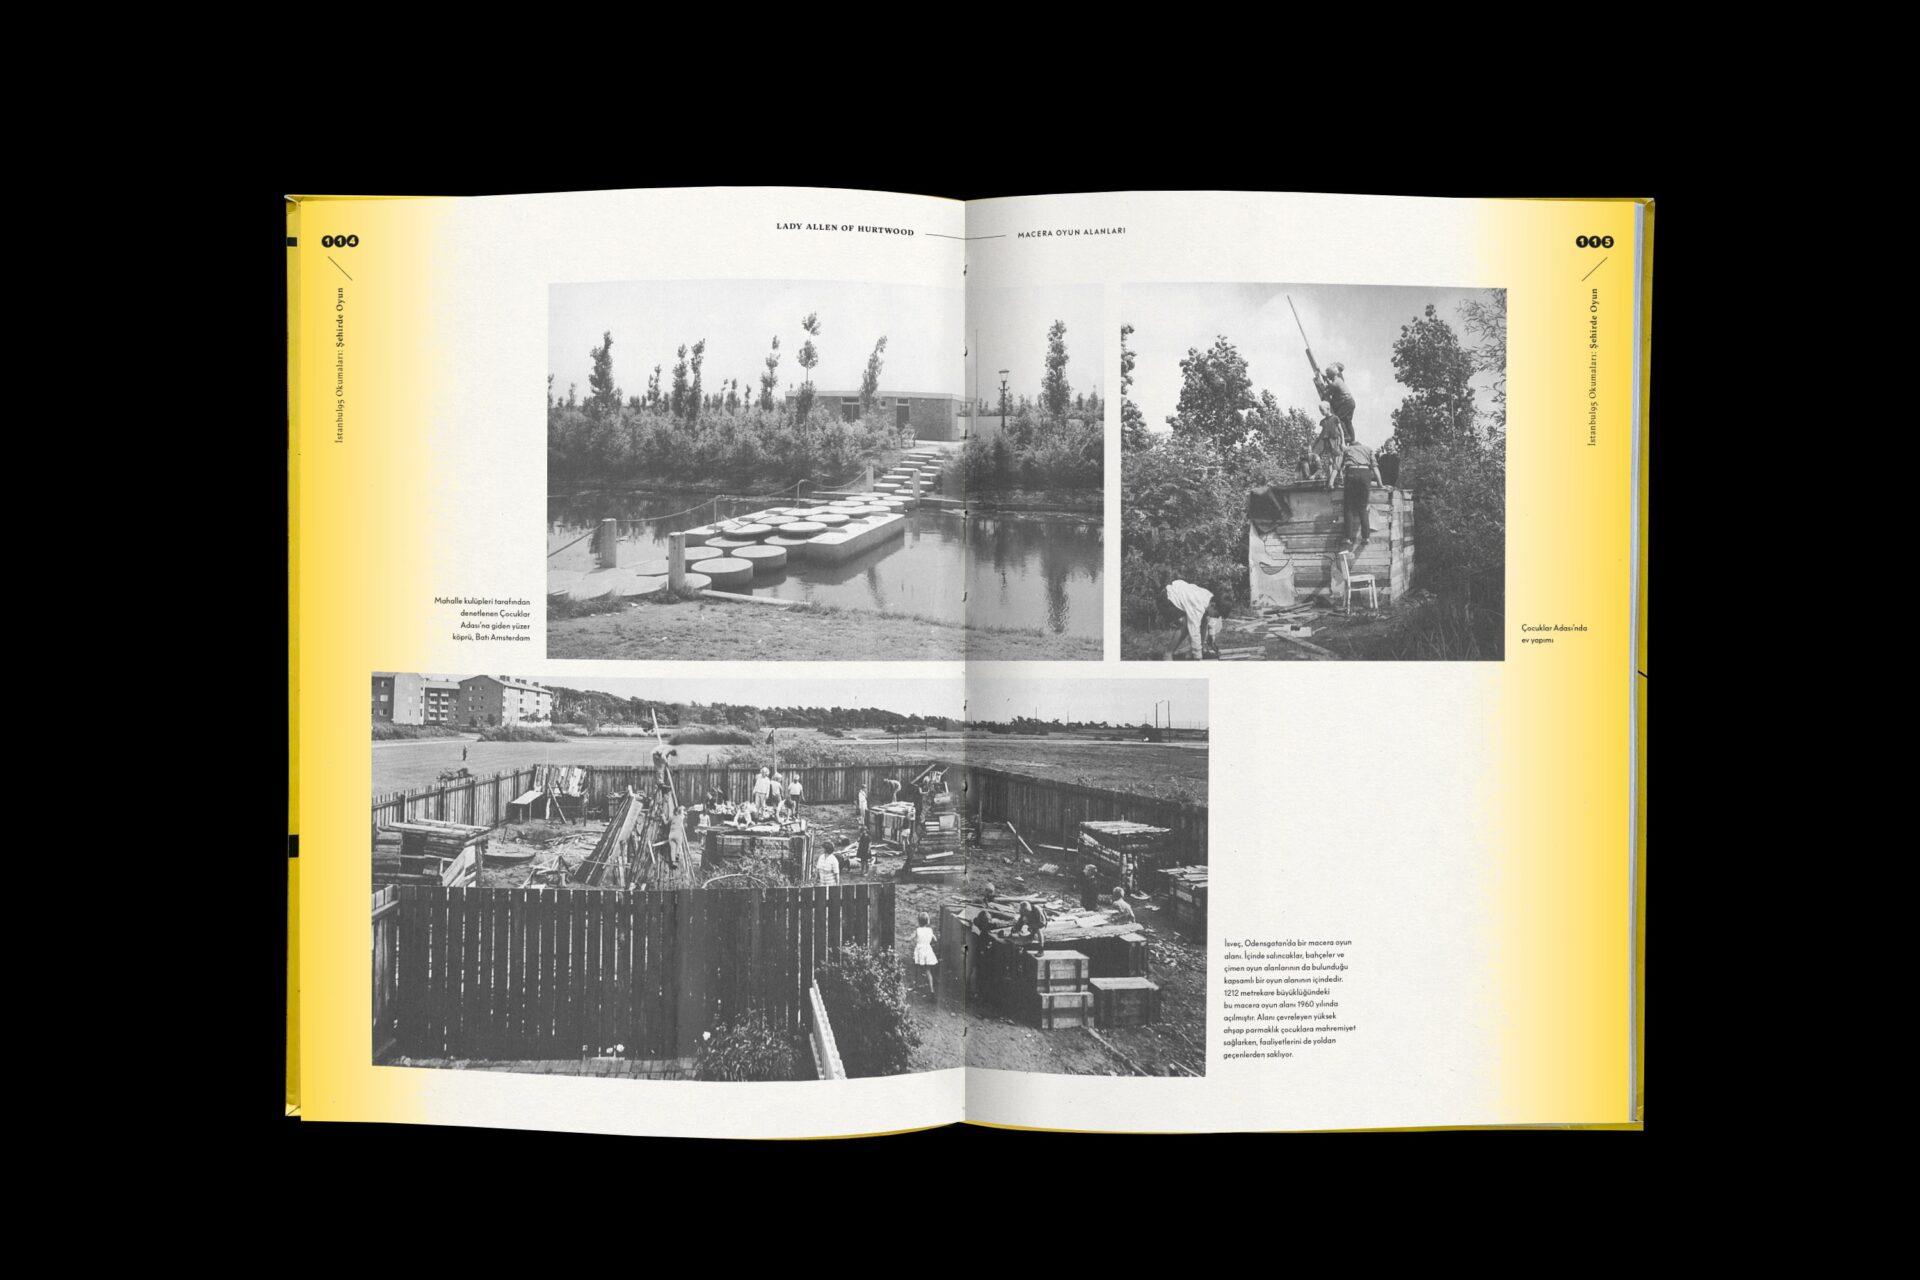 İstanbul95 Okumaları: Şehirde Oyun